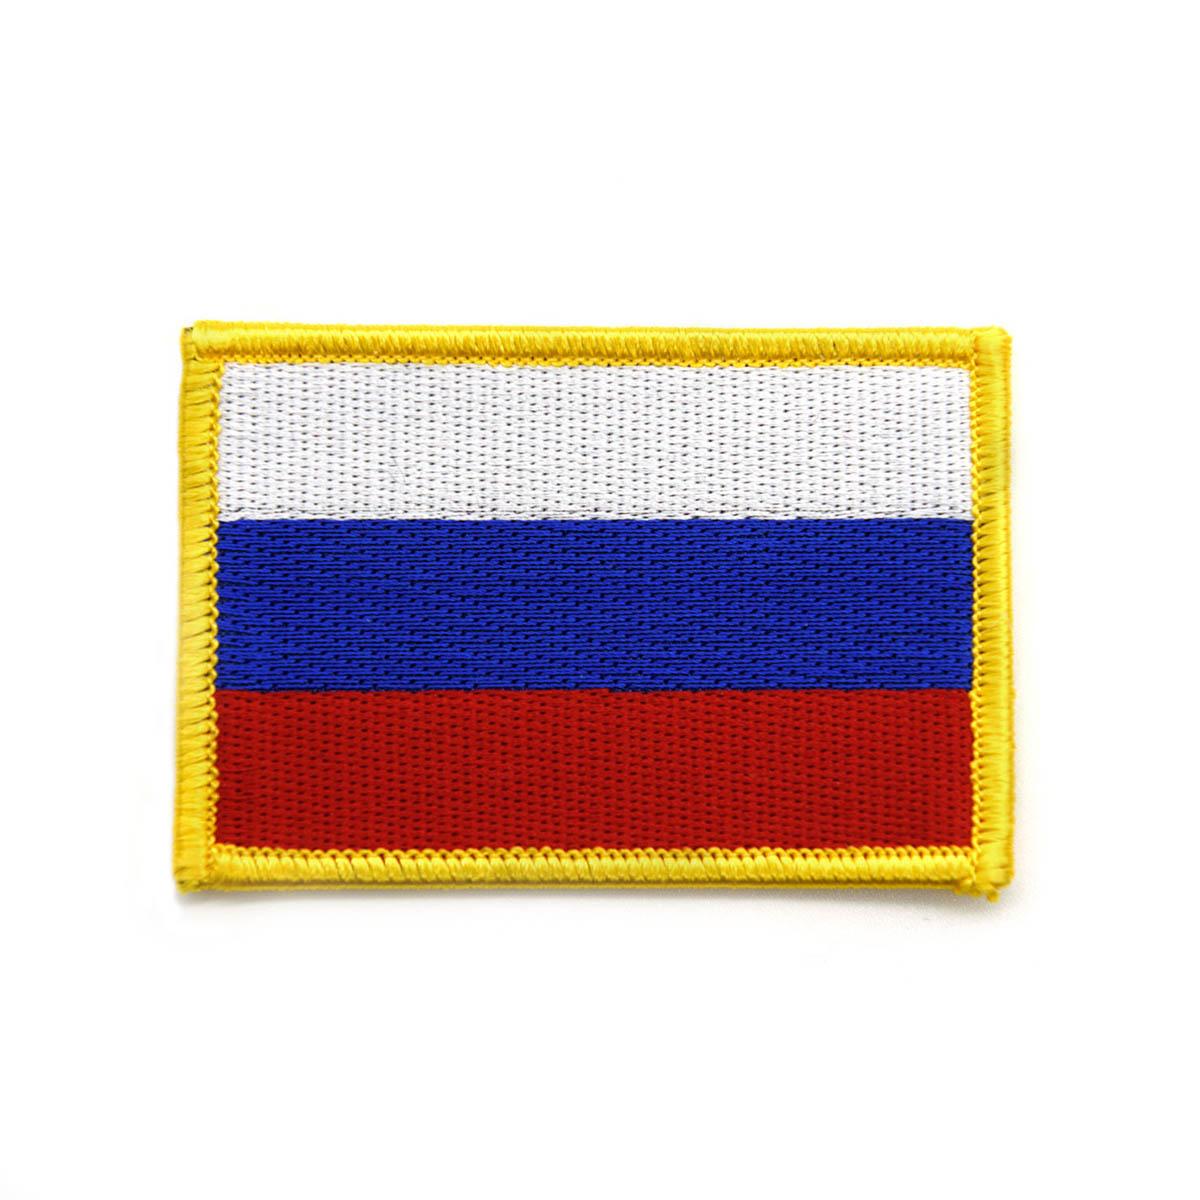 AD1007 Термоаппликация 'Флаг России', 5*7,5 см, Hobby&Pro